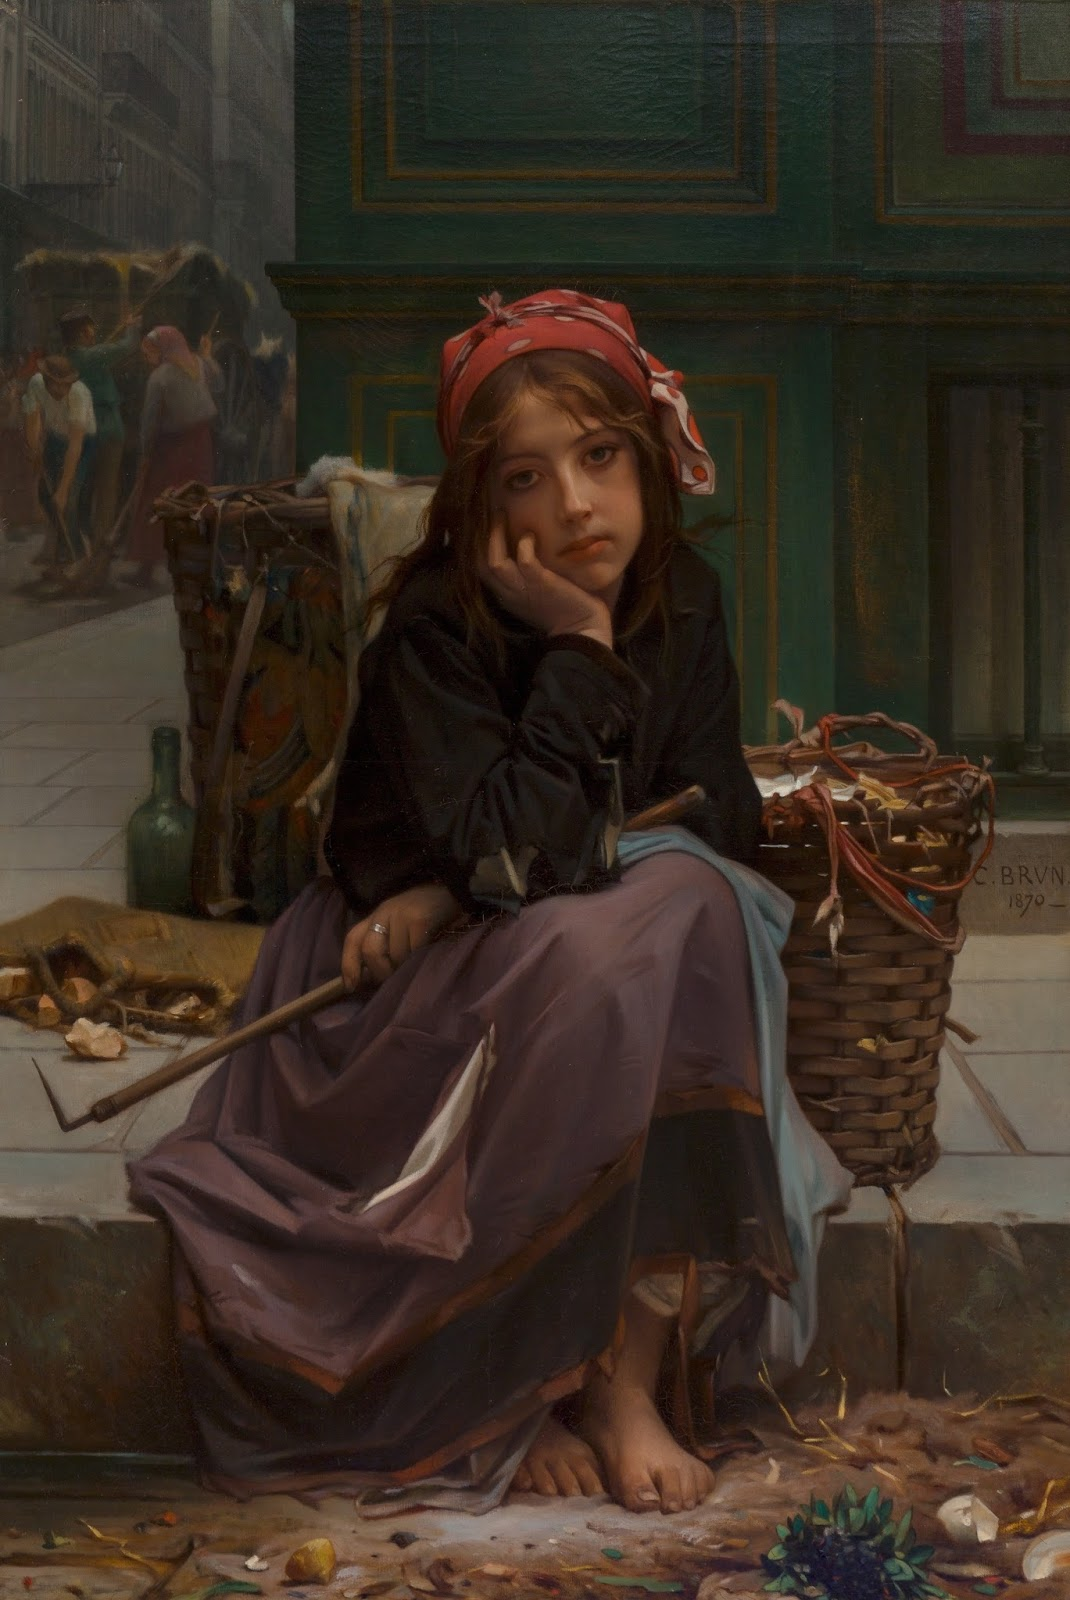 Guillaume Charles Brun -  Young Rag Seller, 1870